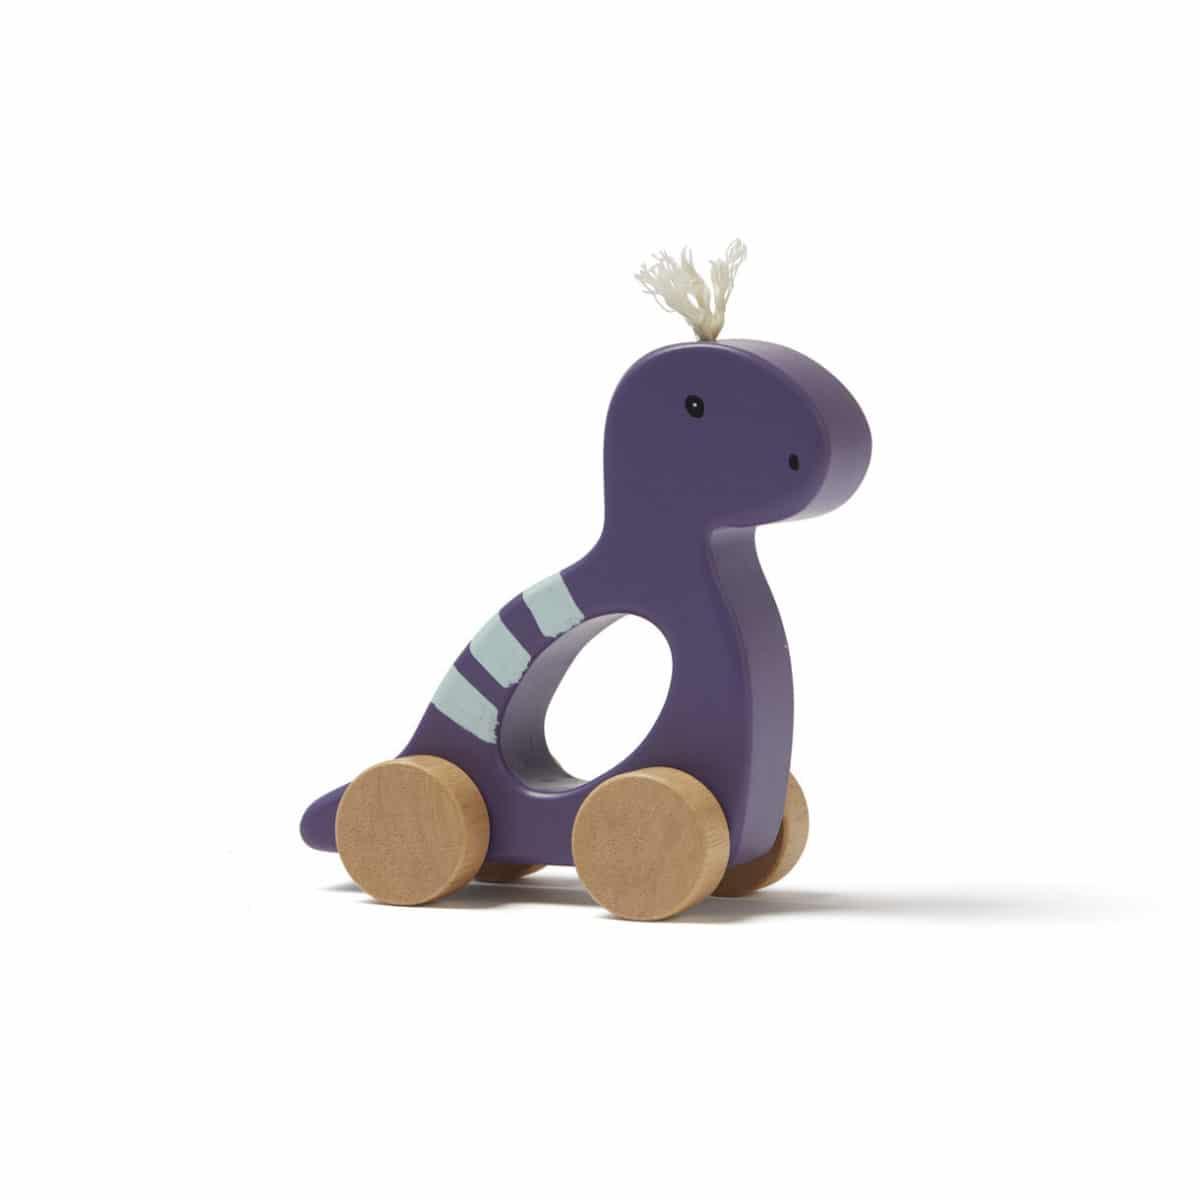 Schiebefigur Dino lila Neo